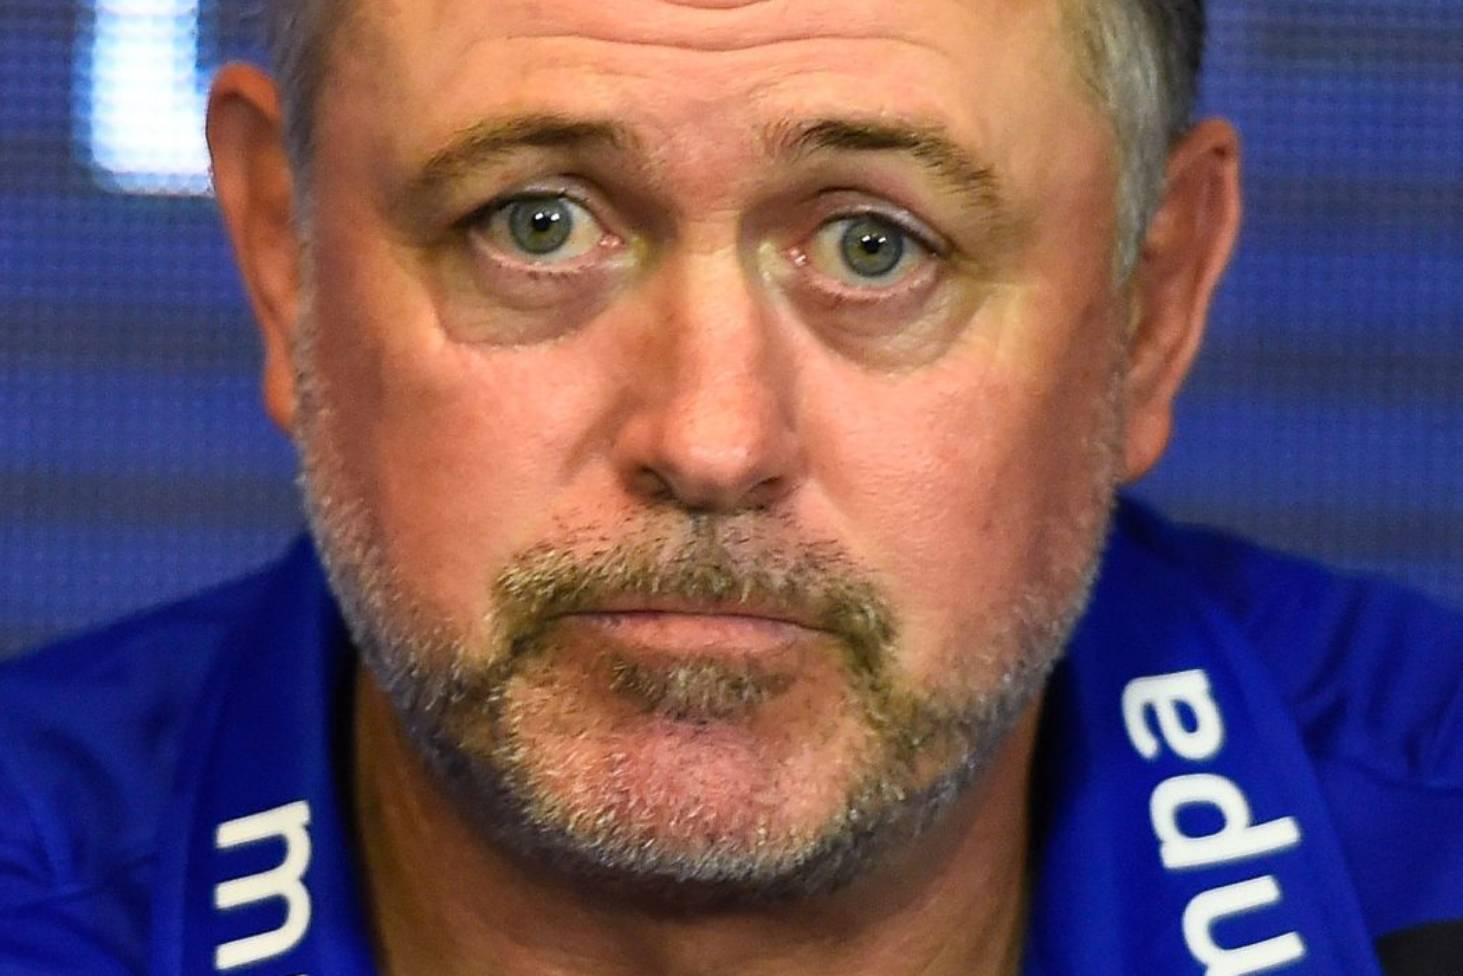 NRL: Mass sackings at Canterbury Bulldogs ahead of grudge match